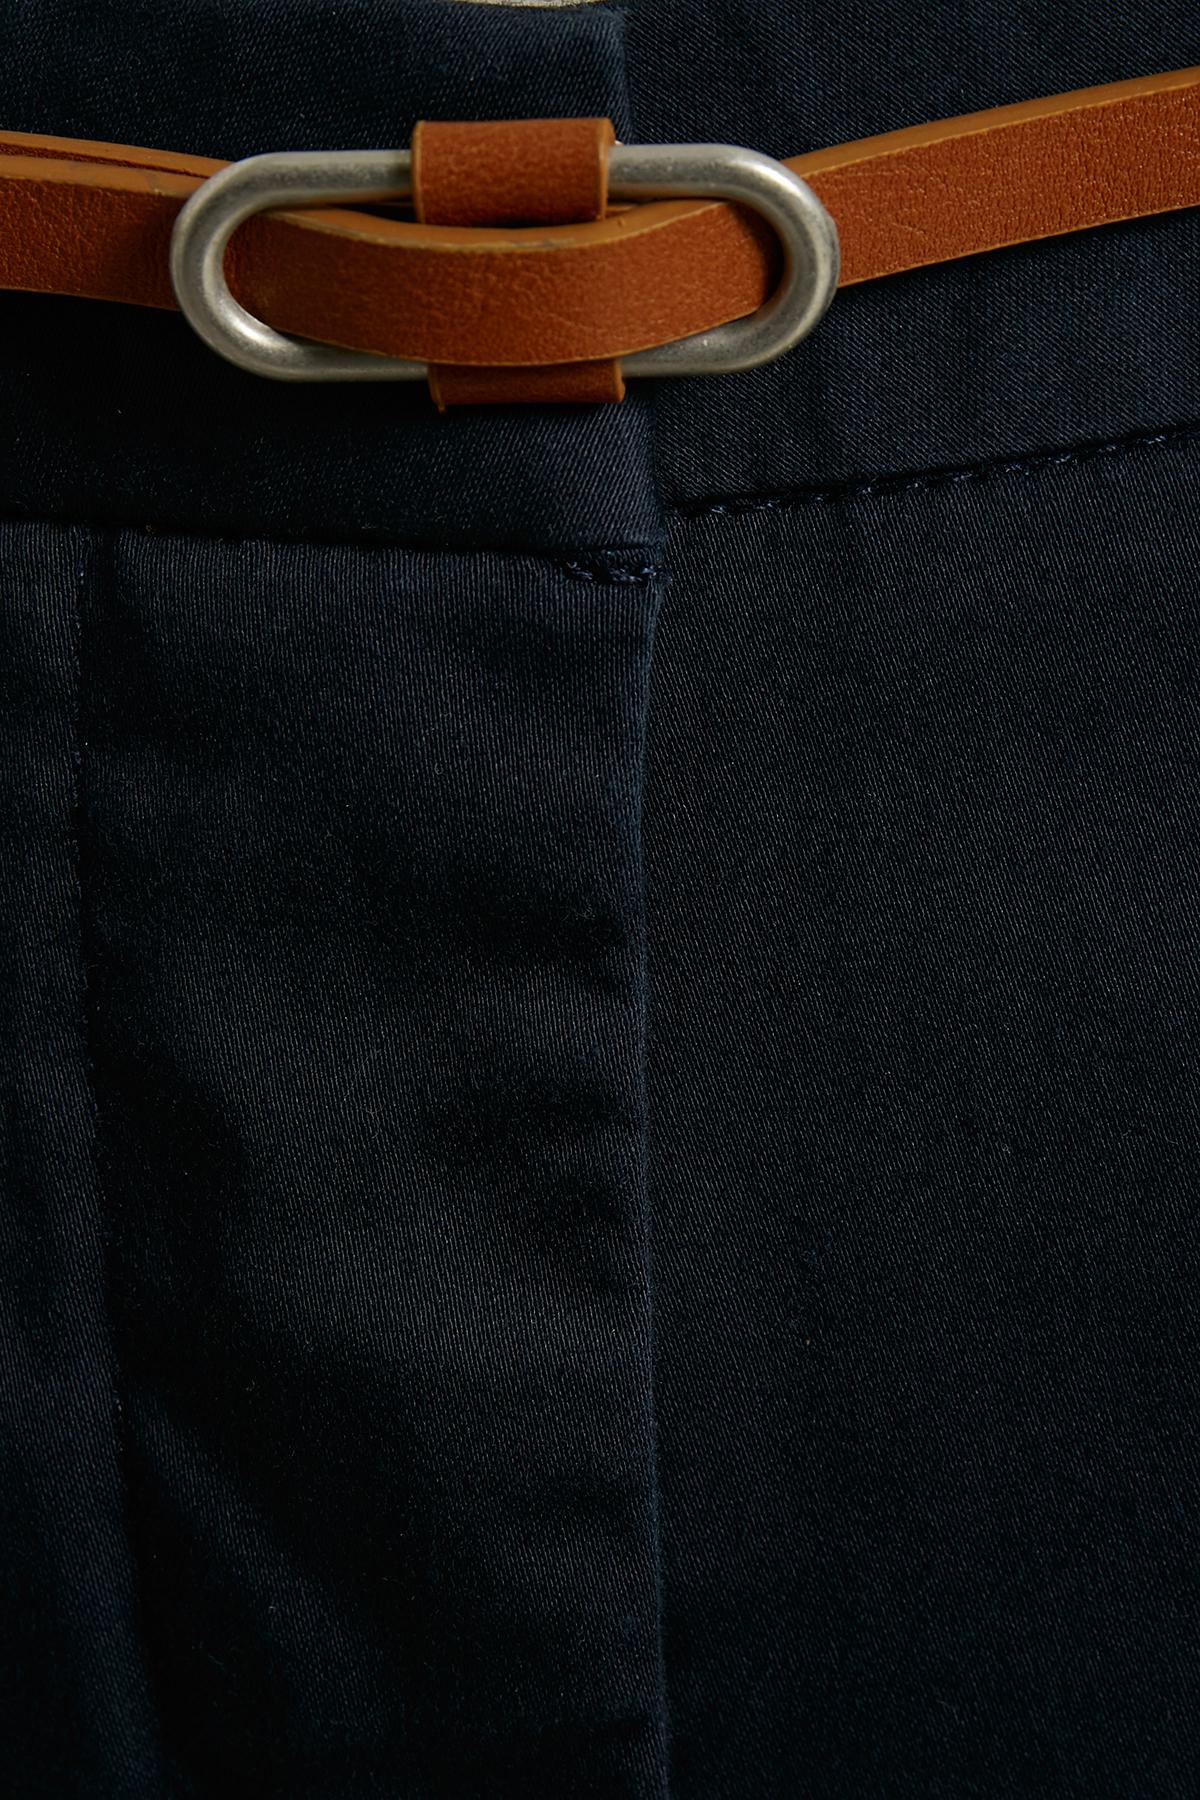 Marineblau Hose von b.young – Shoppen Sie Marineblau Hose ab Gr. 34-46 hier